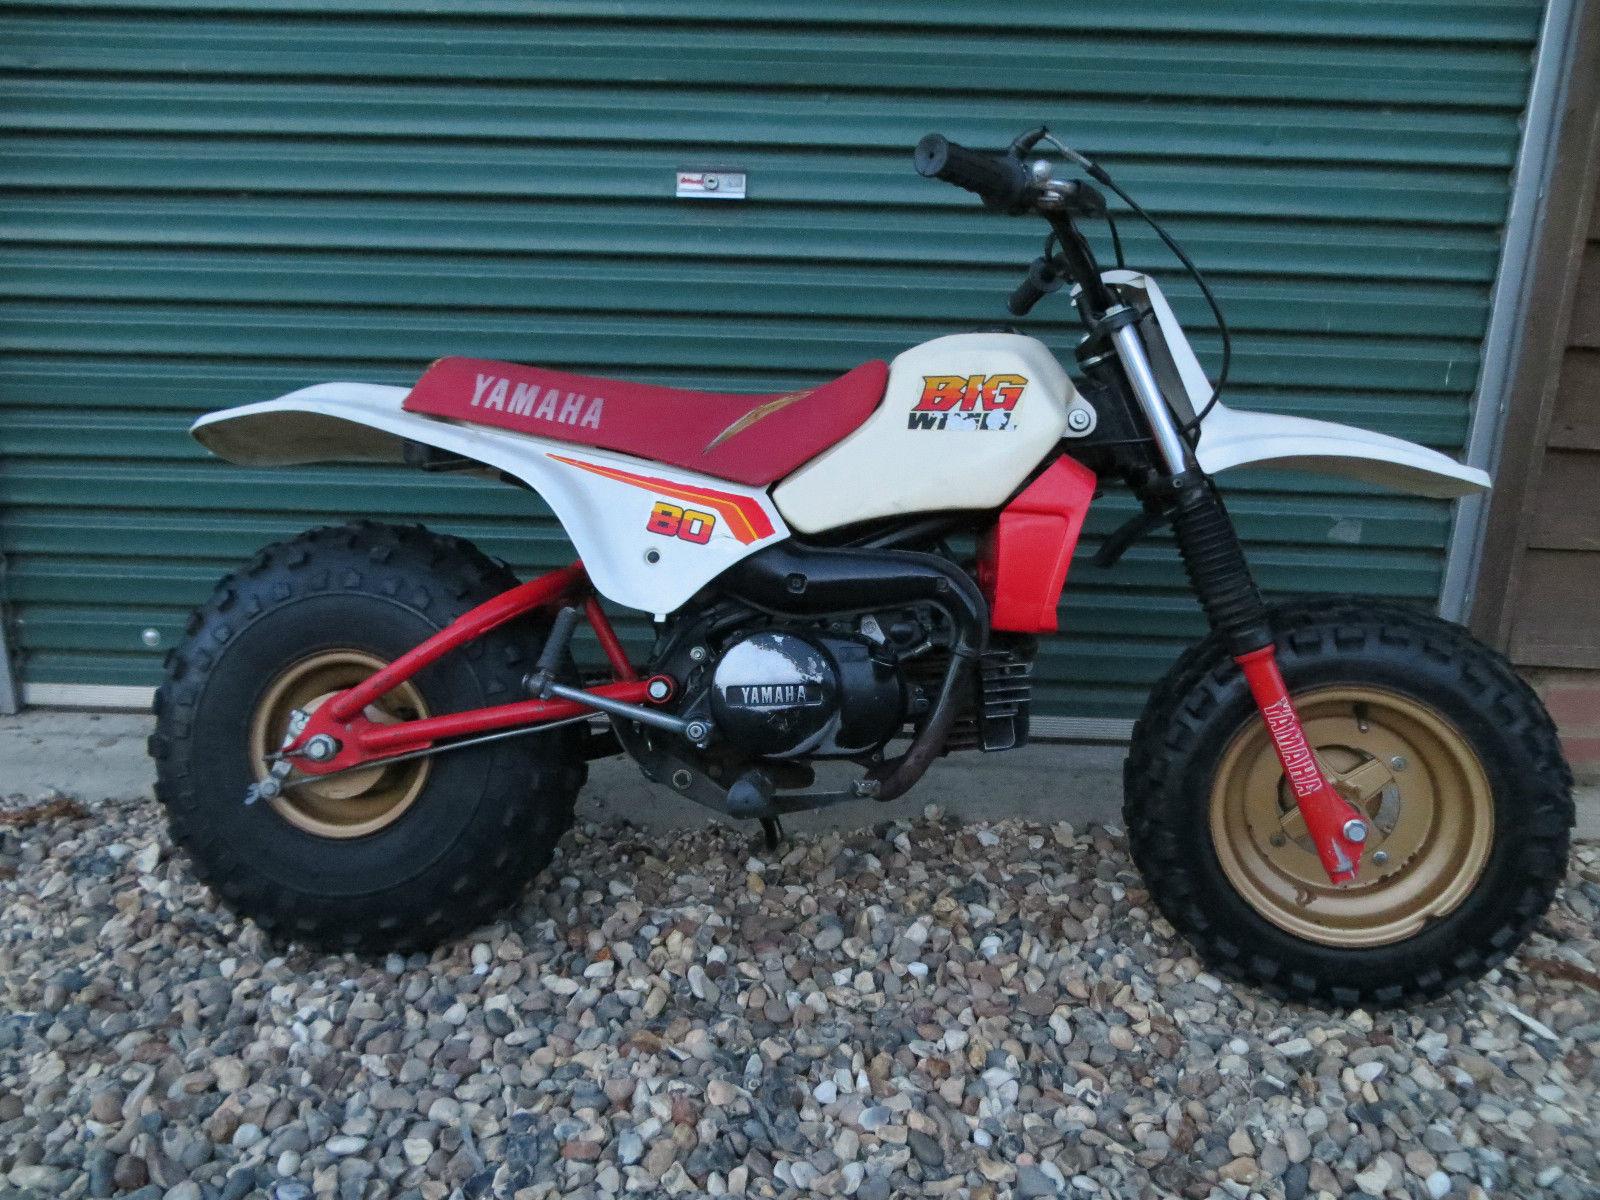 Yamaha BW 80, sand bike, fat cat, mini bike, monkey bike